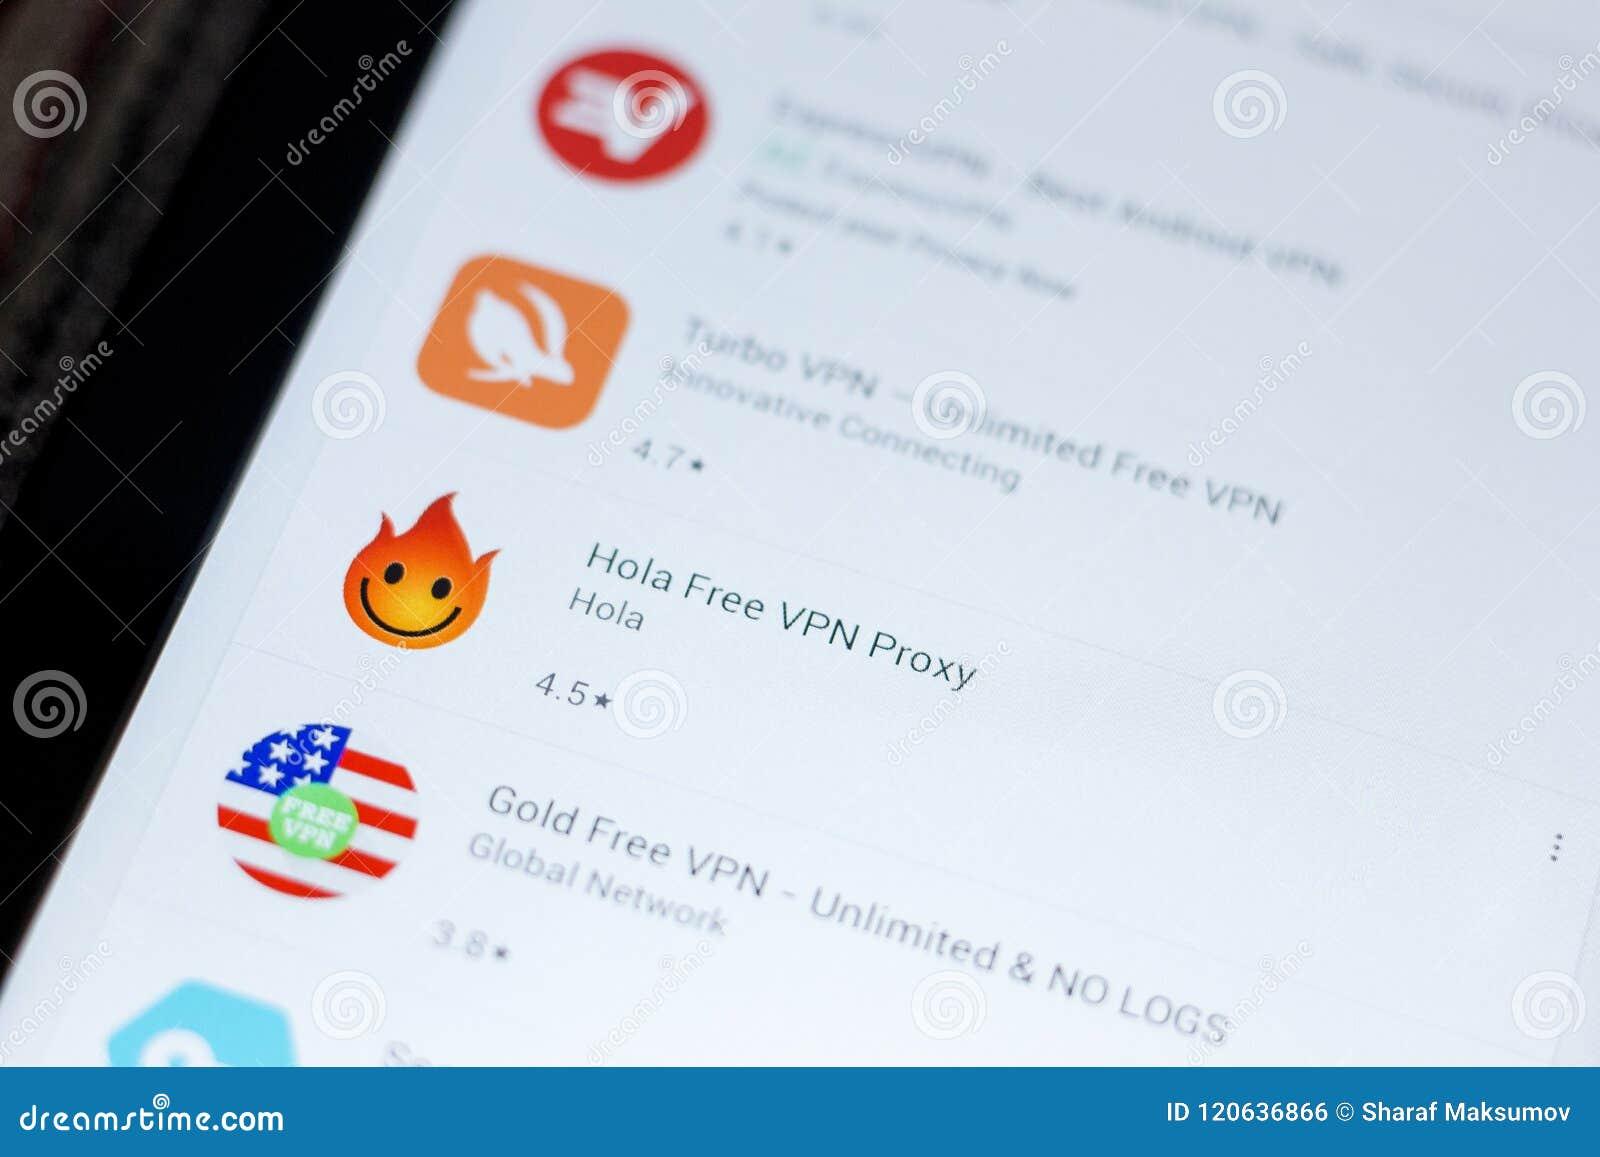 Ryazan, Russia - July 03, 2018: Hola Free VPN Proxy Icon In The List